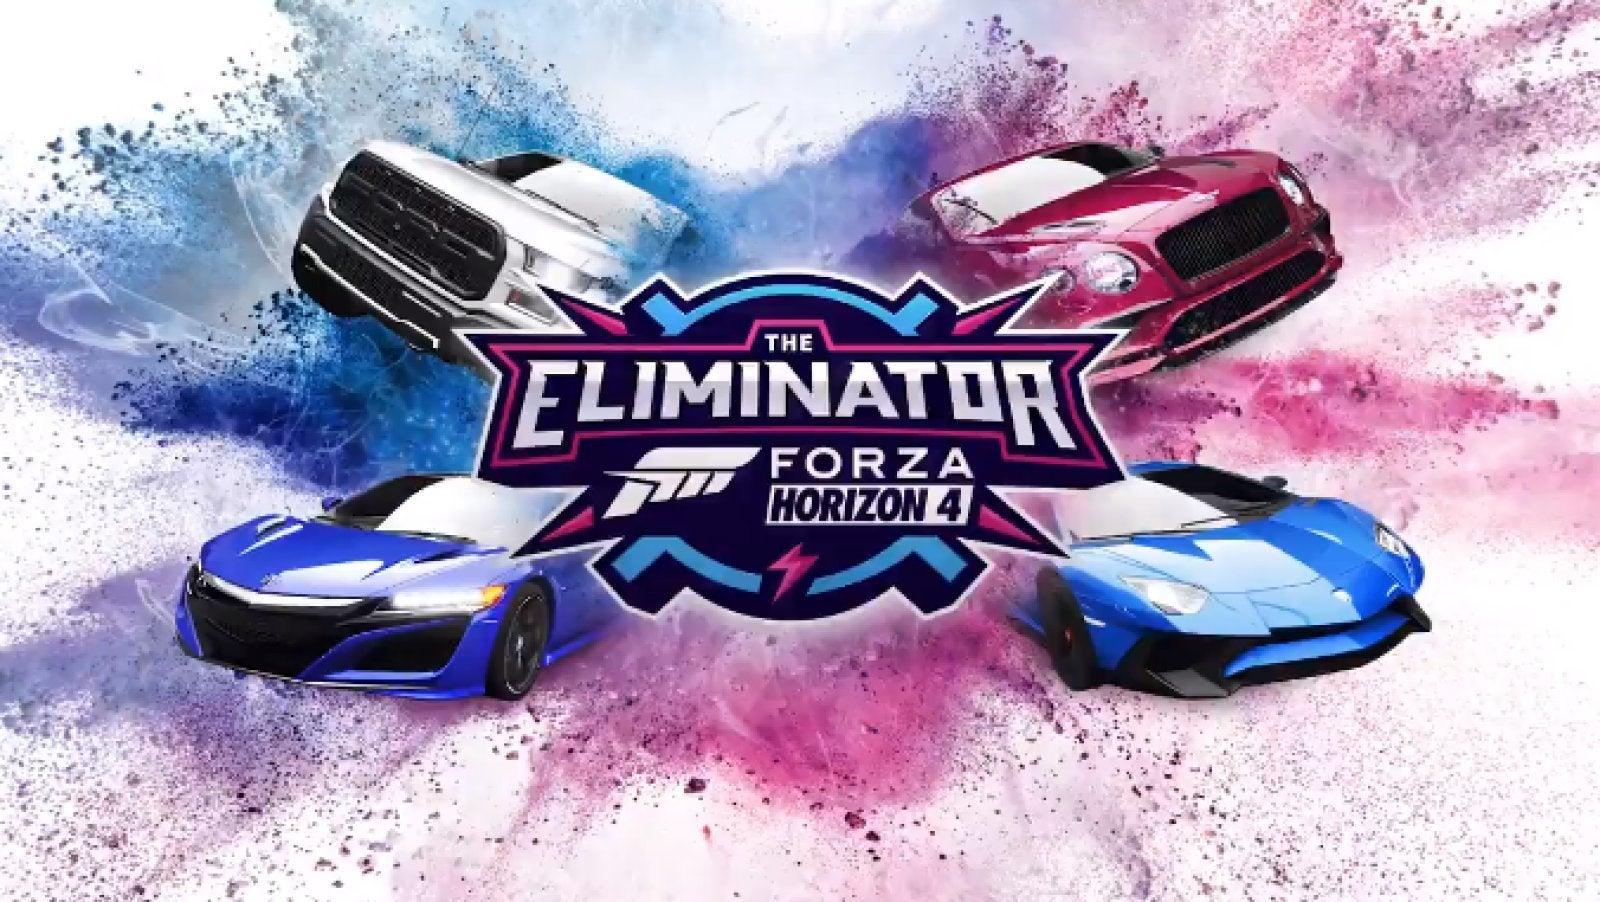 Image for Forza Horizon 4 gets battle royale mode called 'The Eliminator'